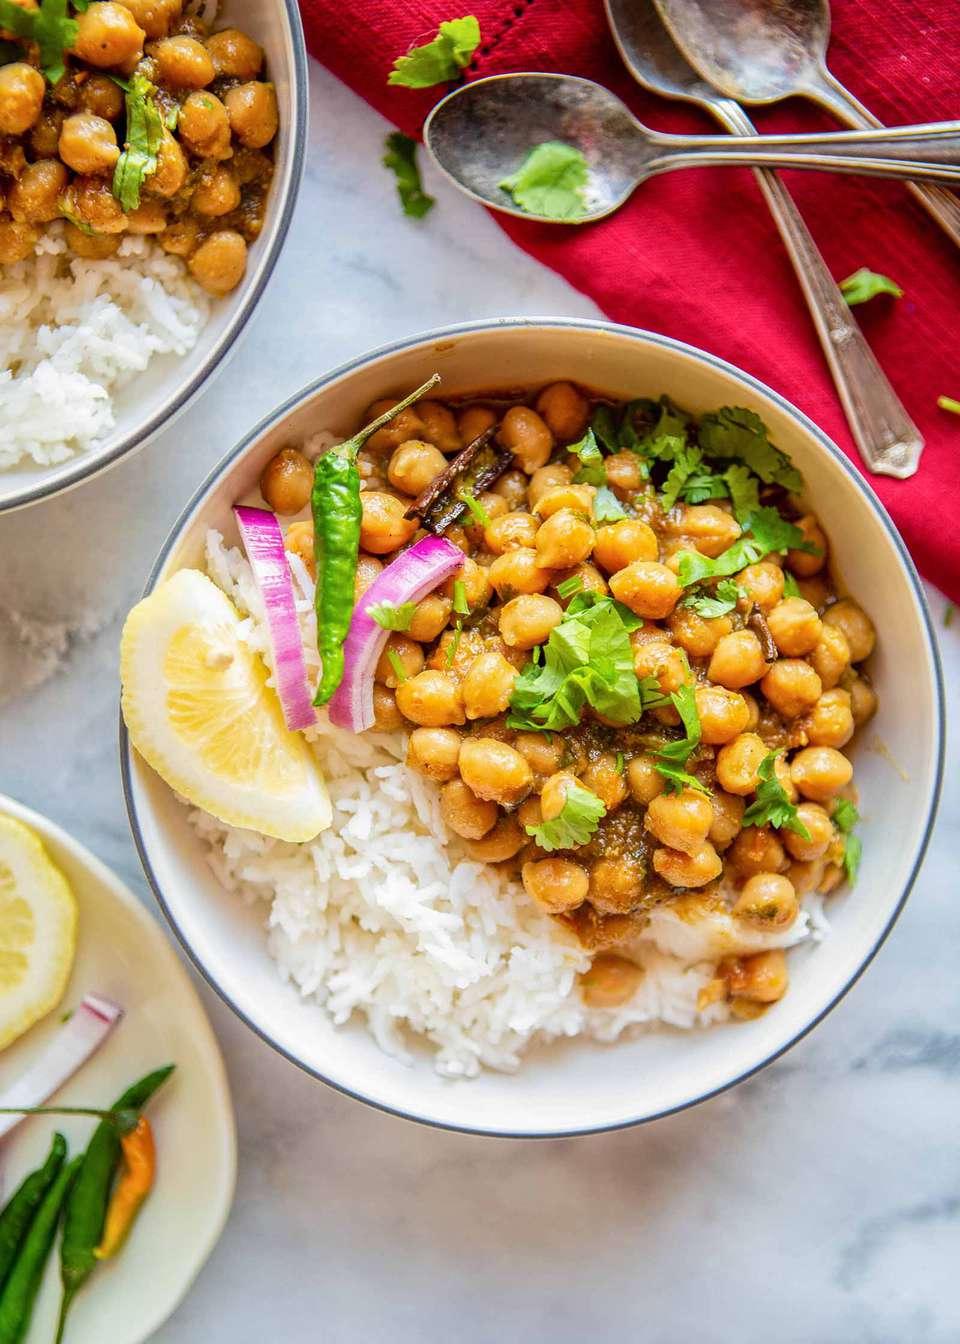 Vegetarian Chana Masala - bowl of chana masala with rice, and lemon wedge